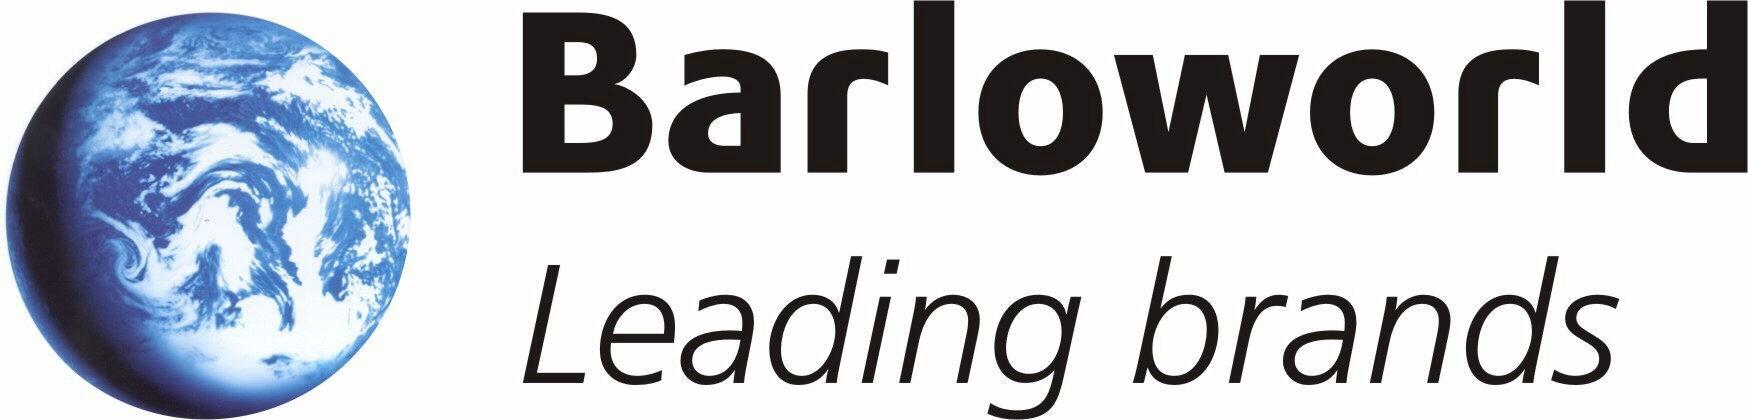 Barloworld Limited logo